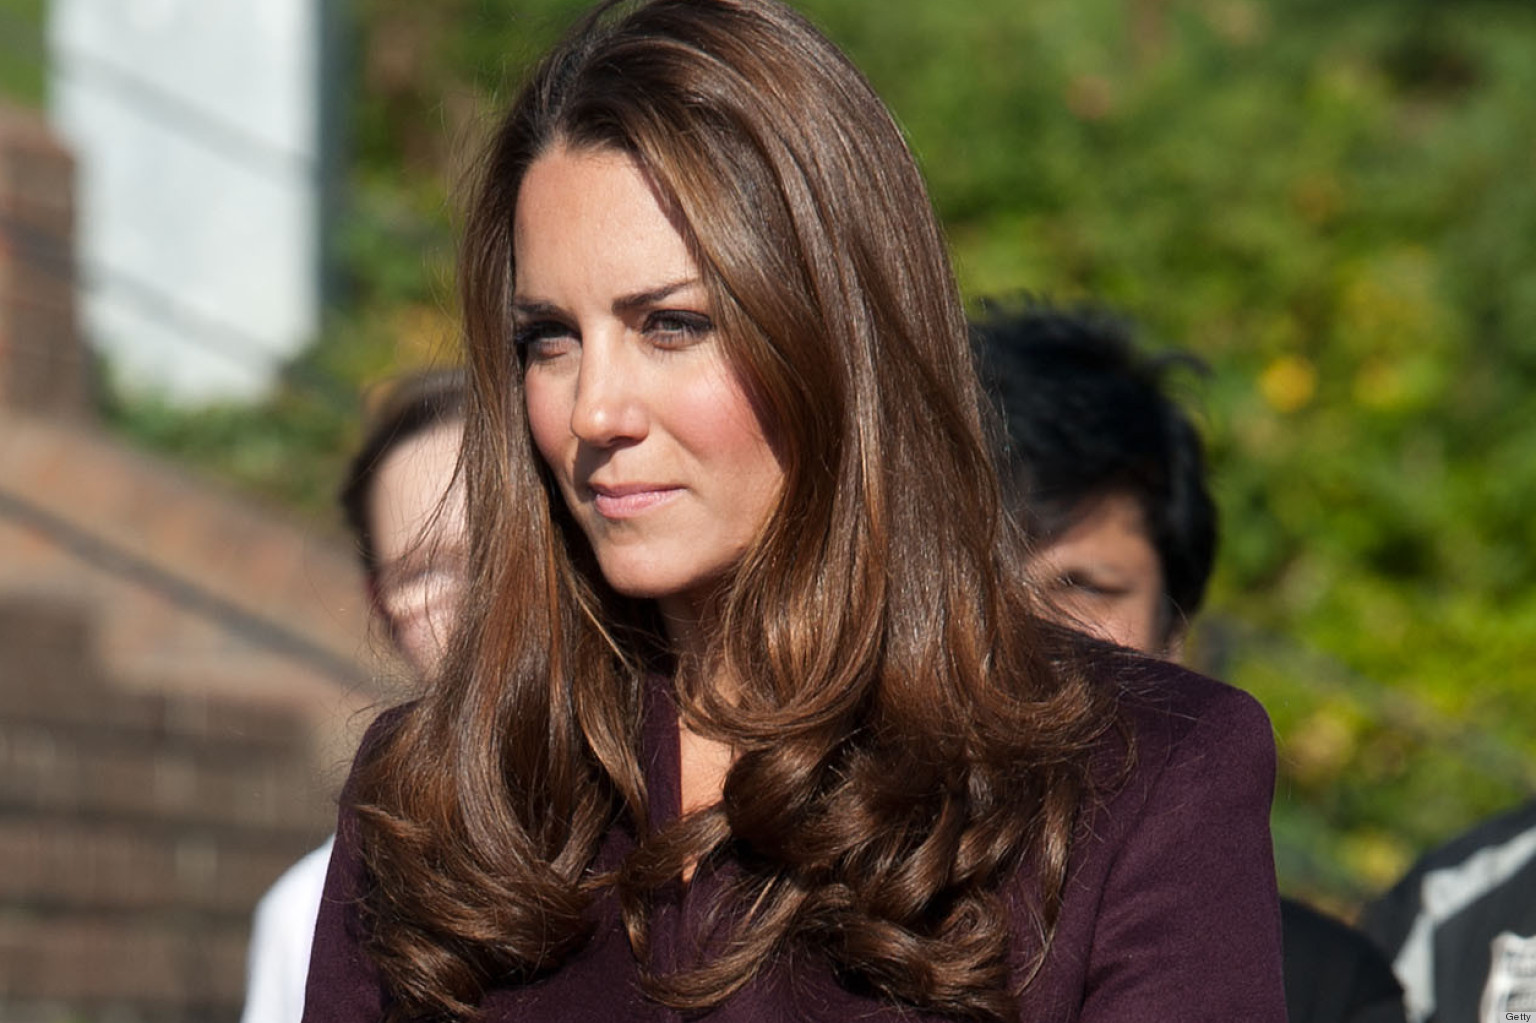 Kate Middleton Nude Photos: French Police Prepare To